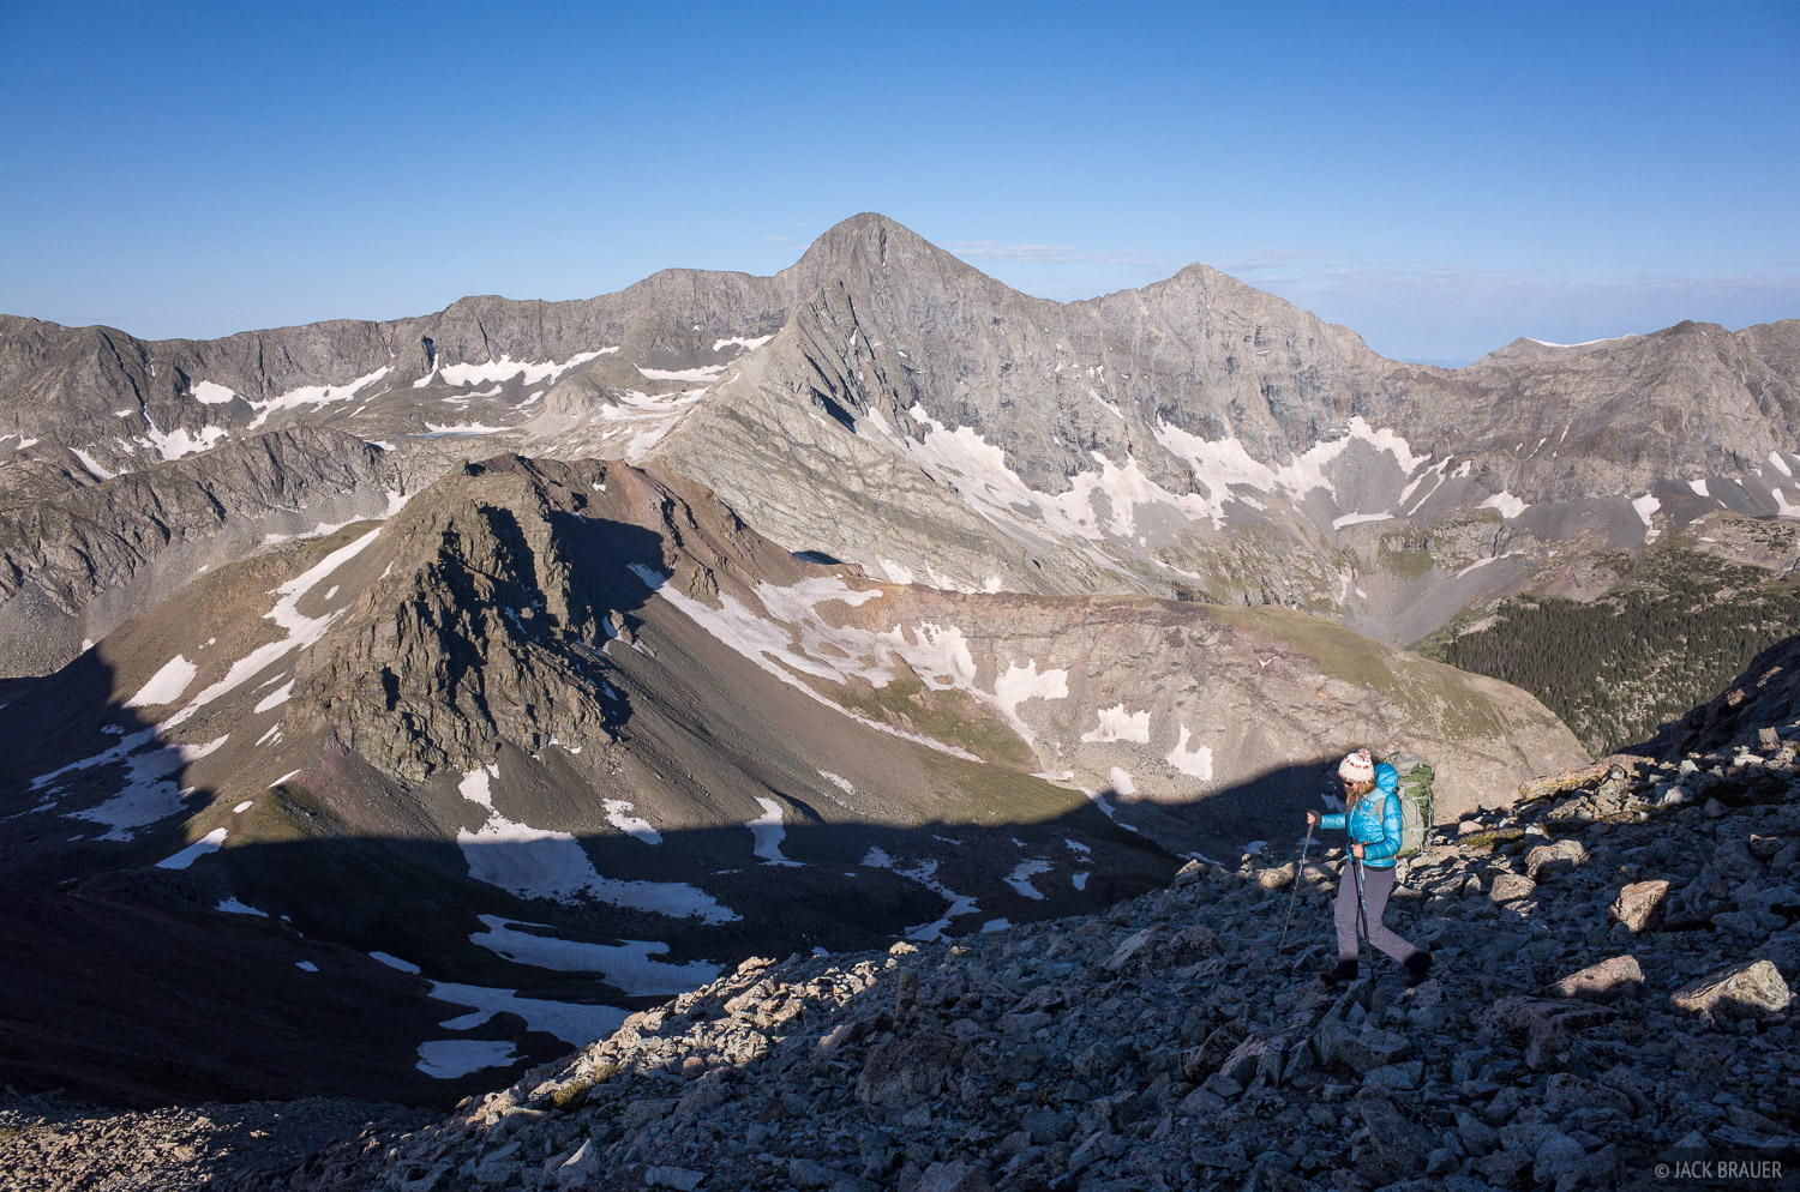 Blanca Peak,Colorado,Sangre de Cristos, hiking, fourteener, photo